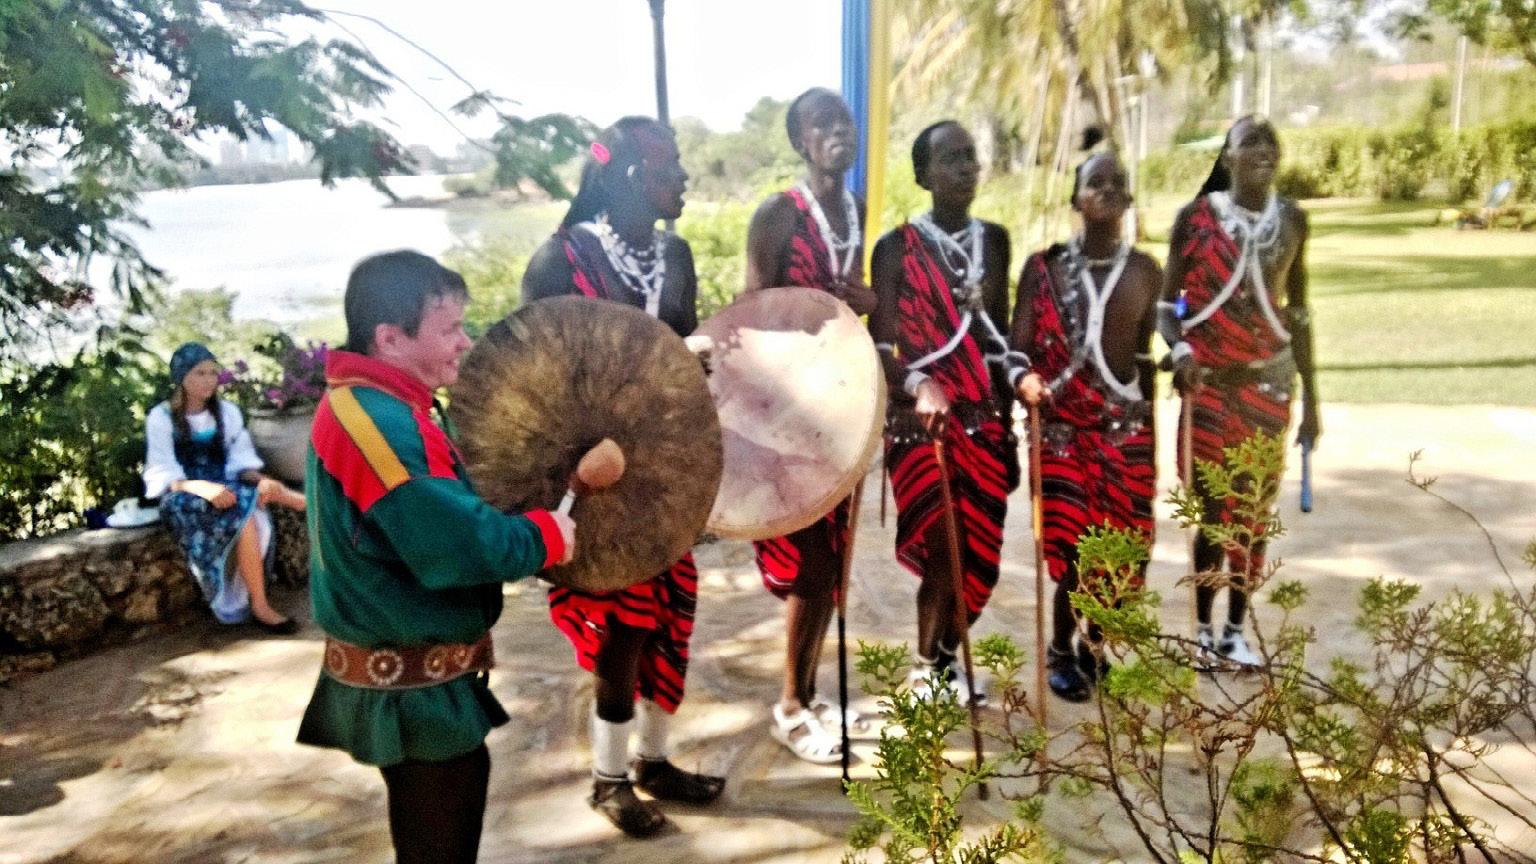 FIGURE 12. Niiles-Jouni Aikio during one of his tour in Africa (Dar es Salaam, 2013, photo: courtesy of Aikio family).